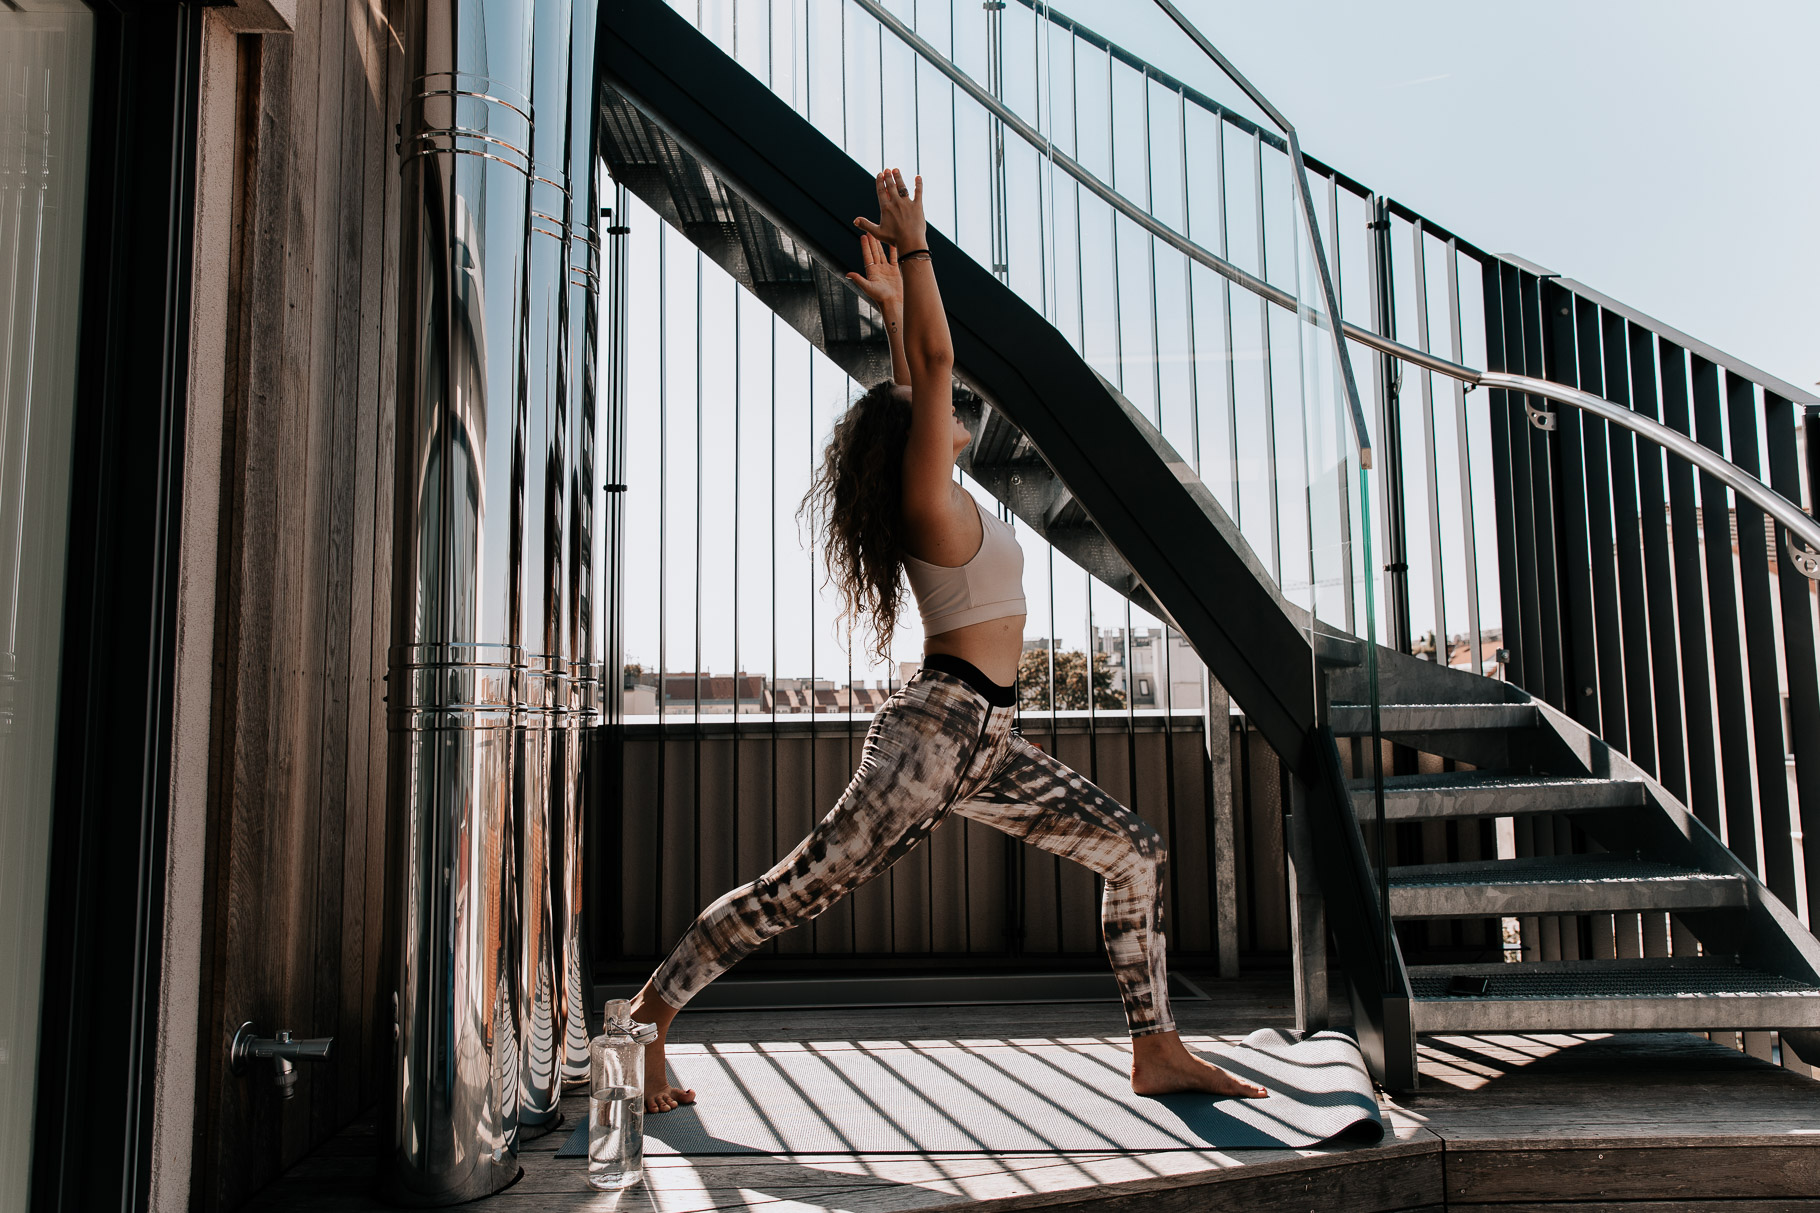 mit yoga beginnen, guide, hanna gassner, marco sommer, annalaurakummer